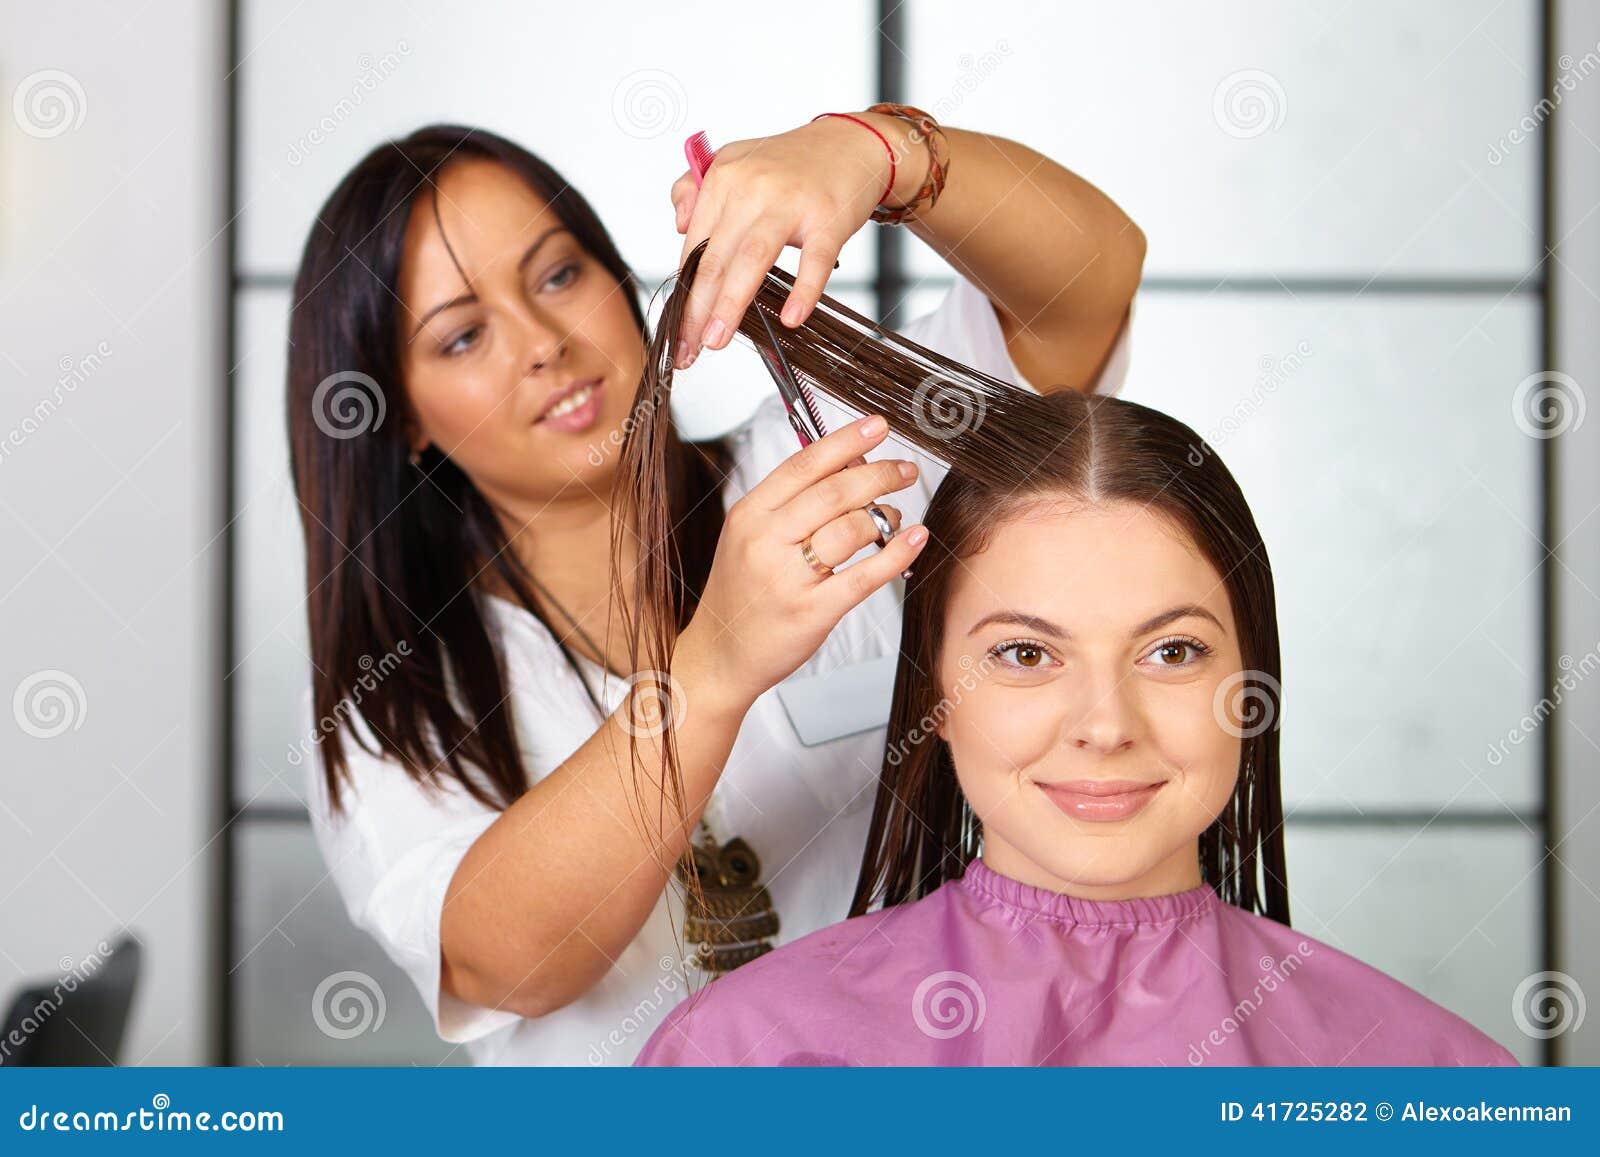 Hair Salon Woman Haircut Cutting Stock Photo Image